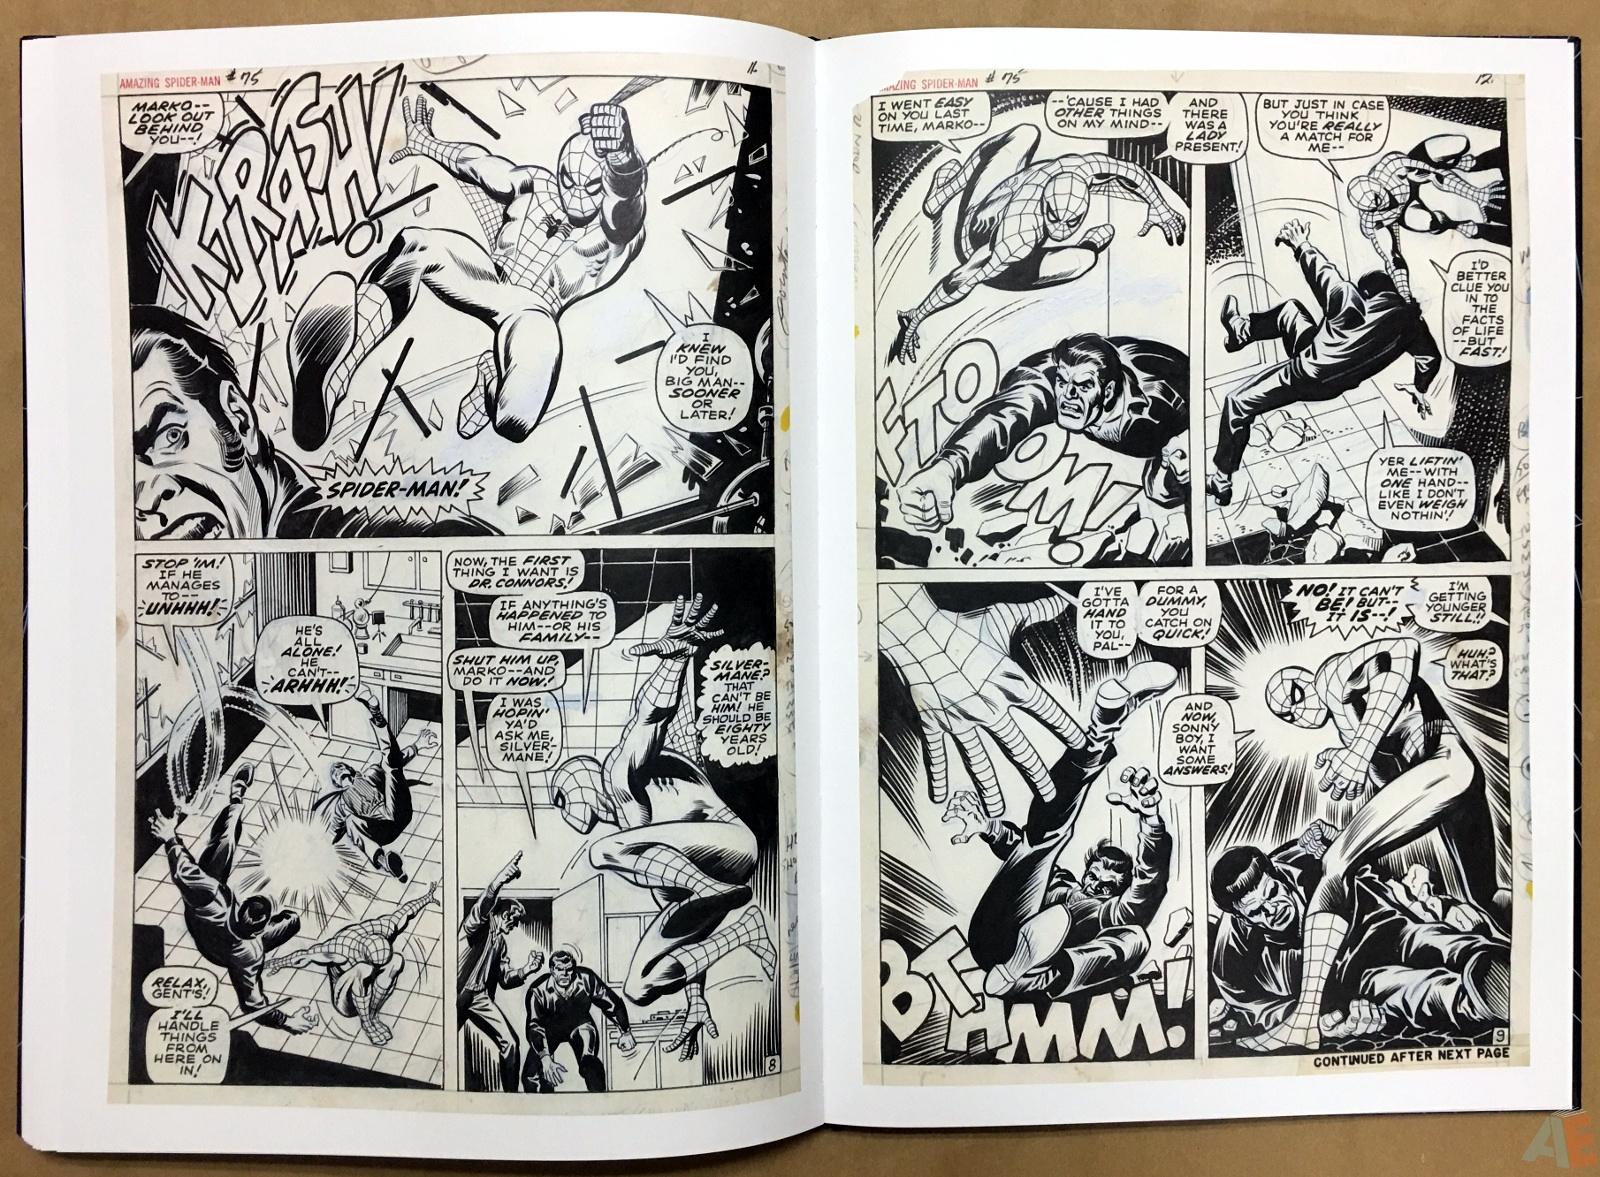 John Romita's The Amazing Spider-Man Artist's Edition 40